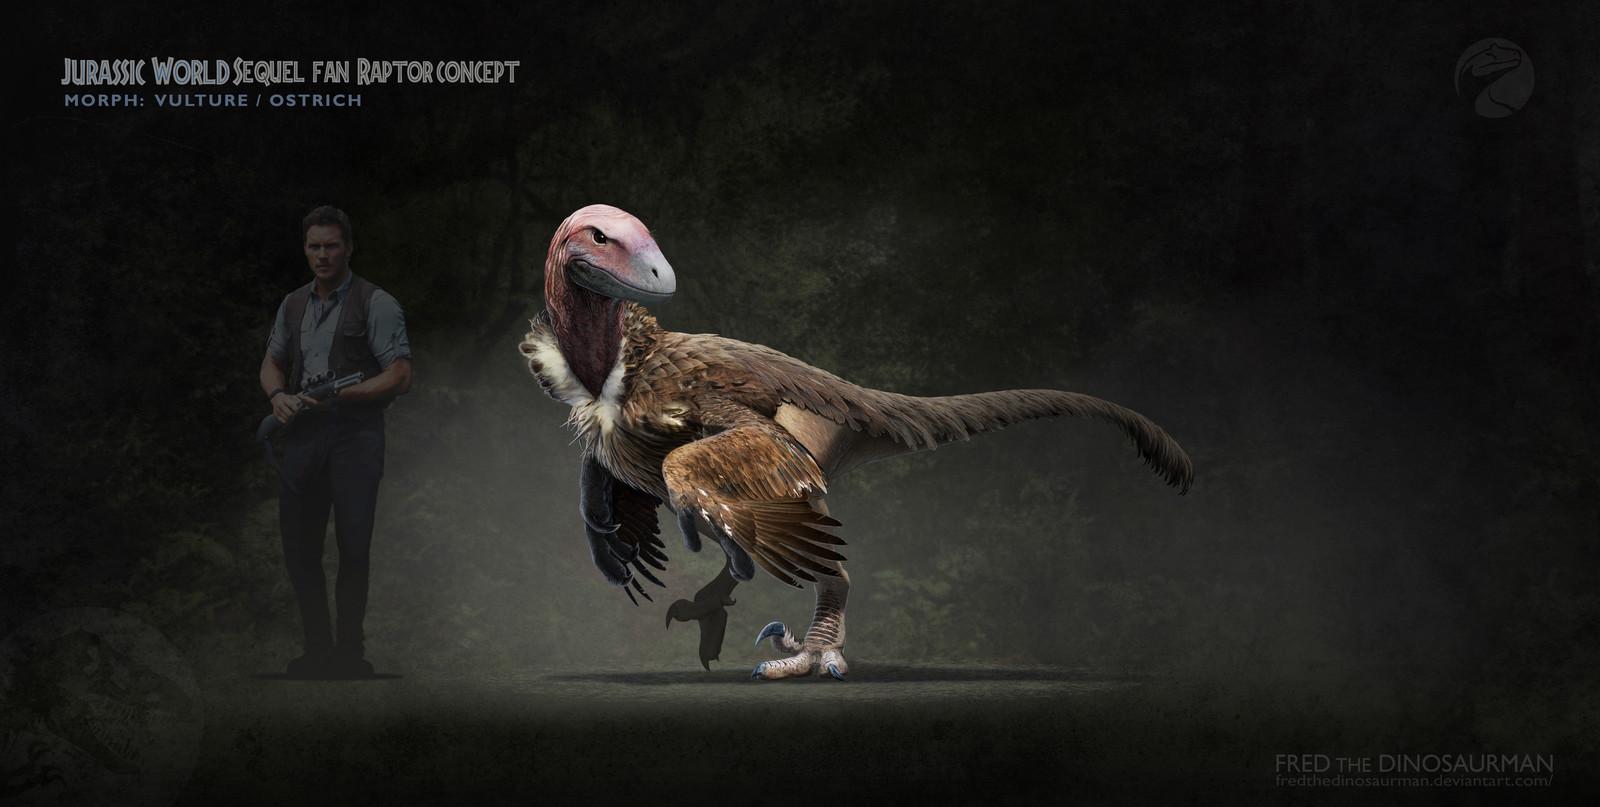 Vulture Morph